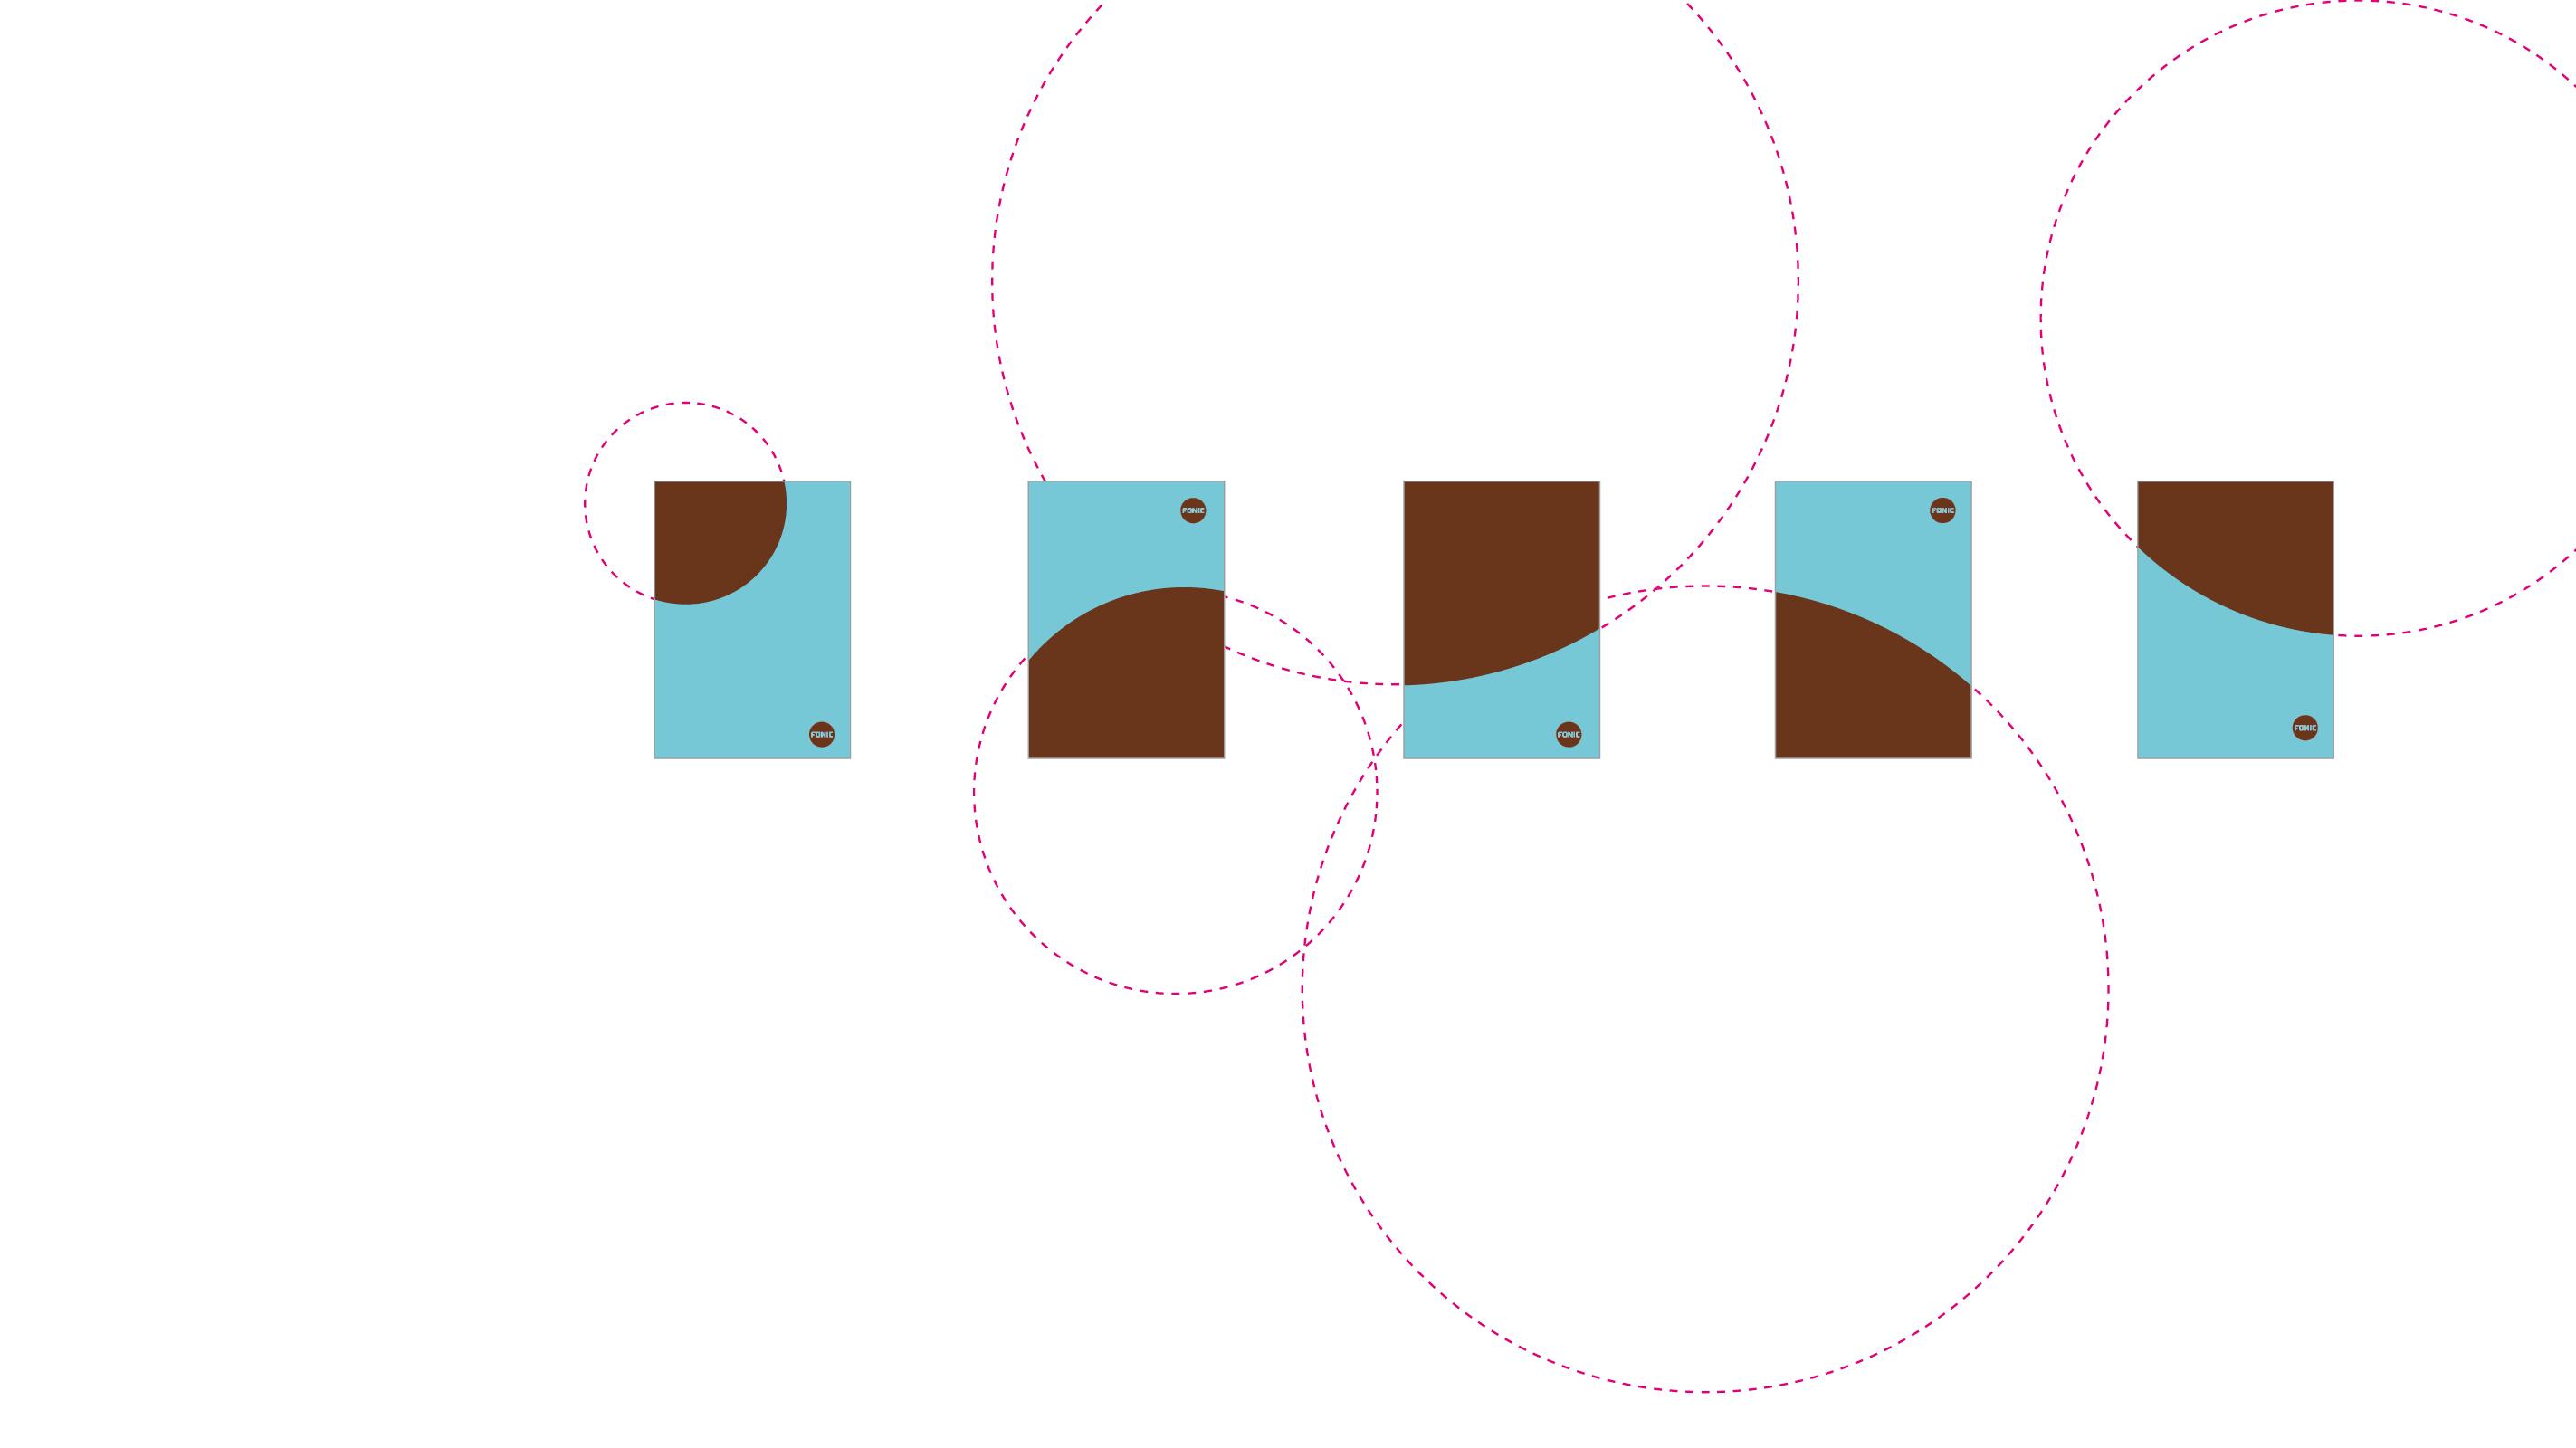 Fonic Layoutprinzip – Poarangan Brand Design